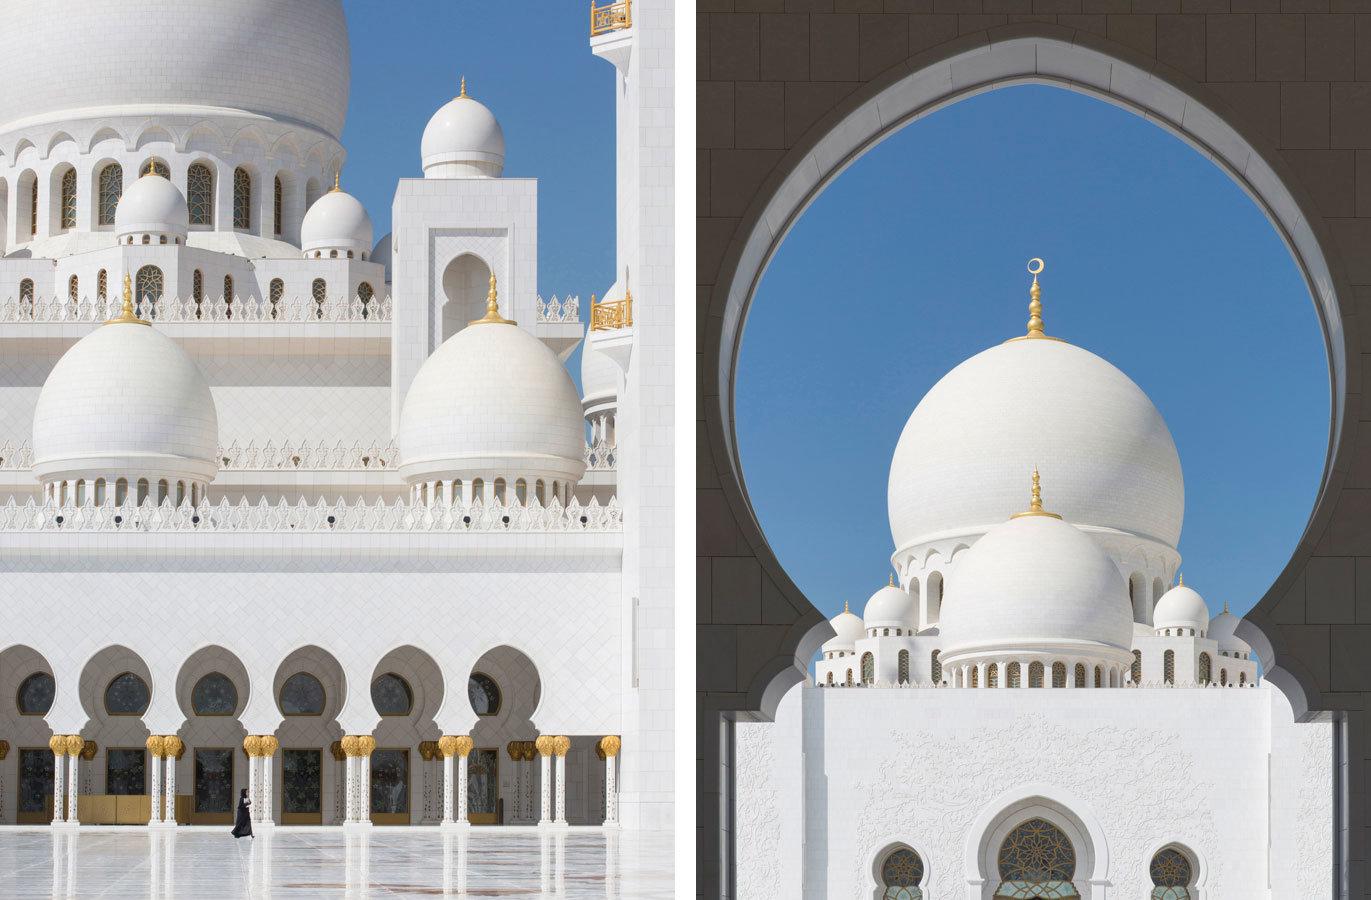 The Grand Mosque - Abu Dhabi